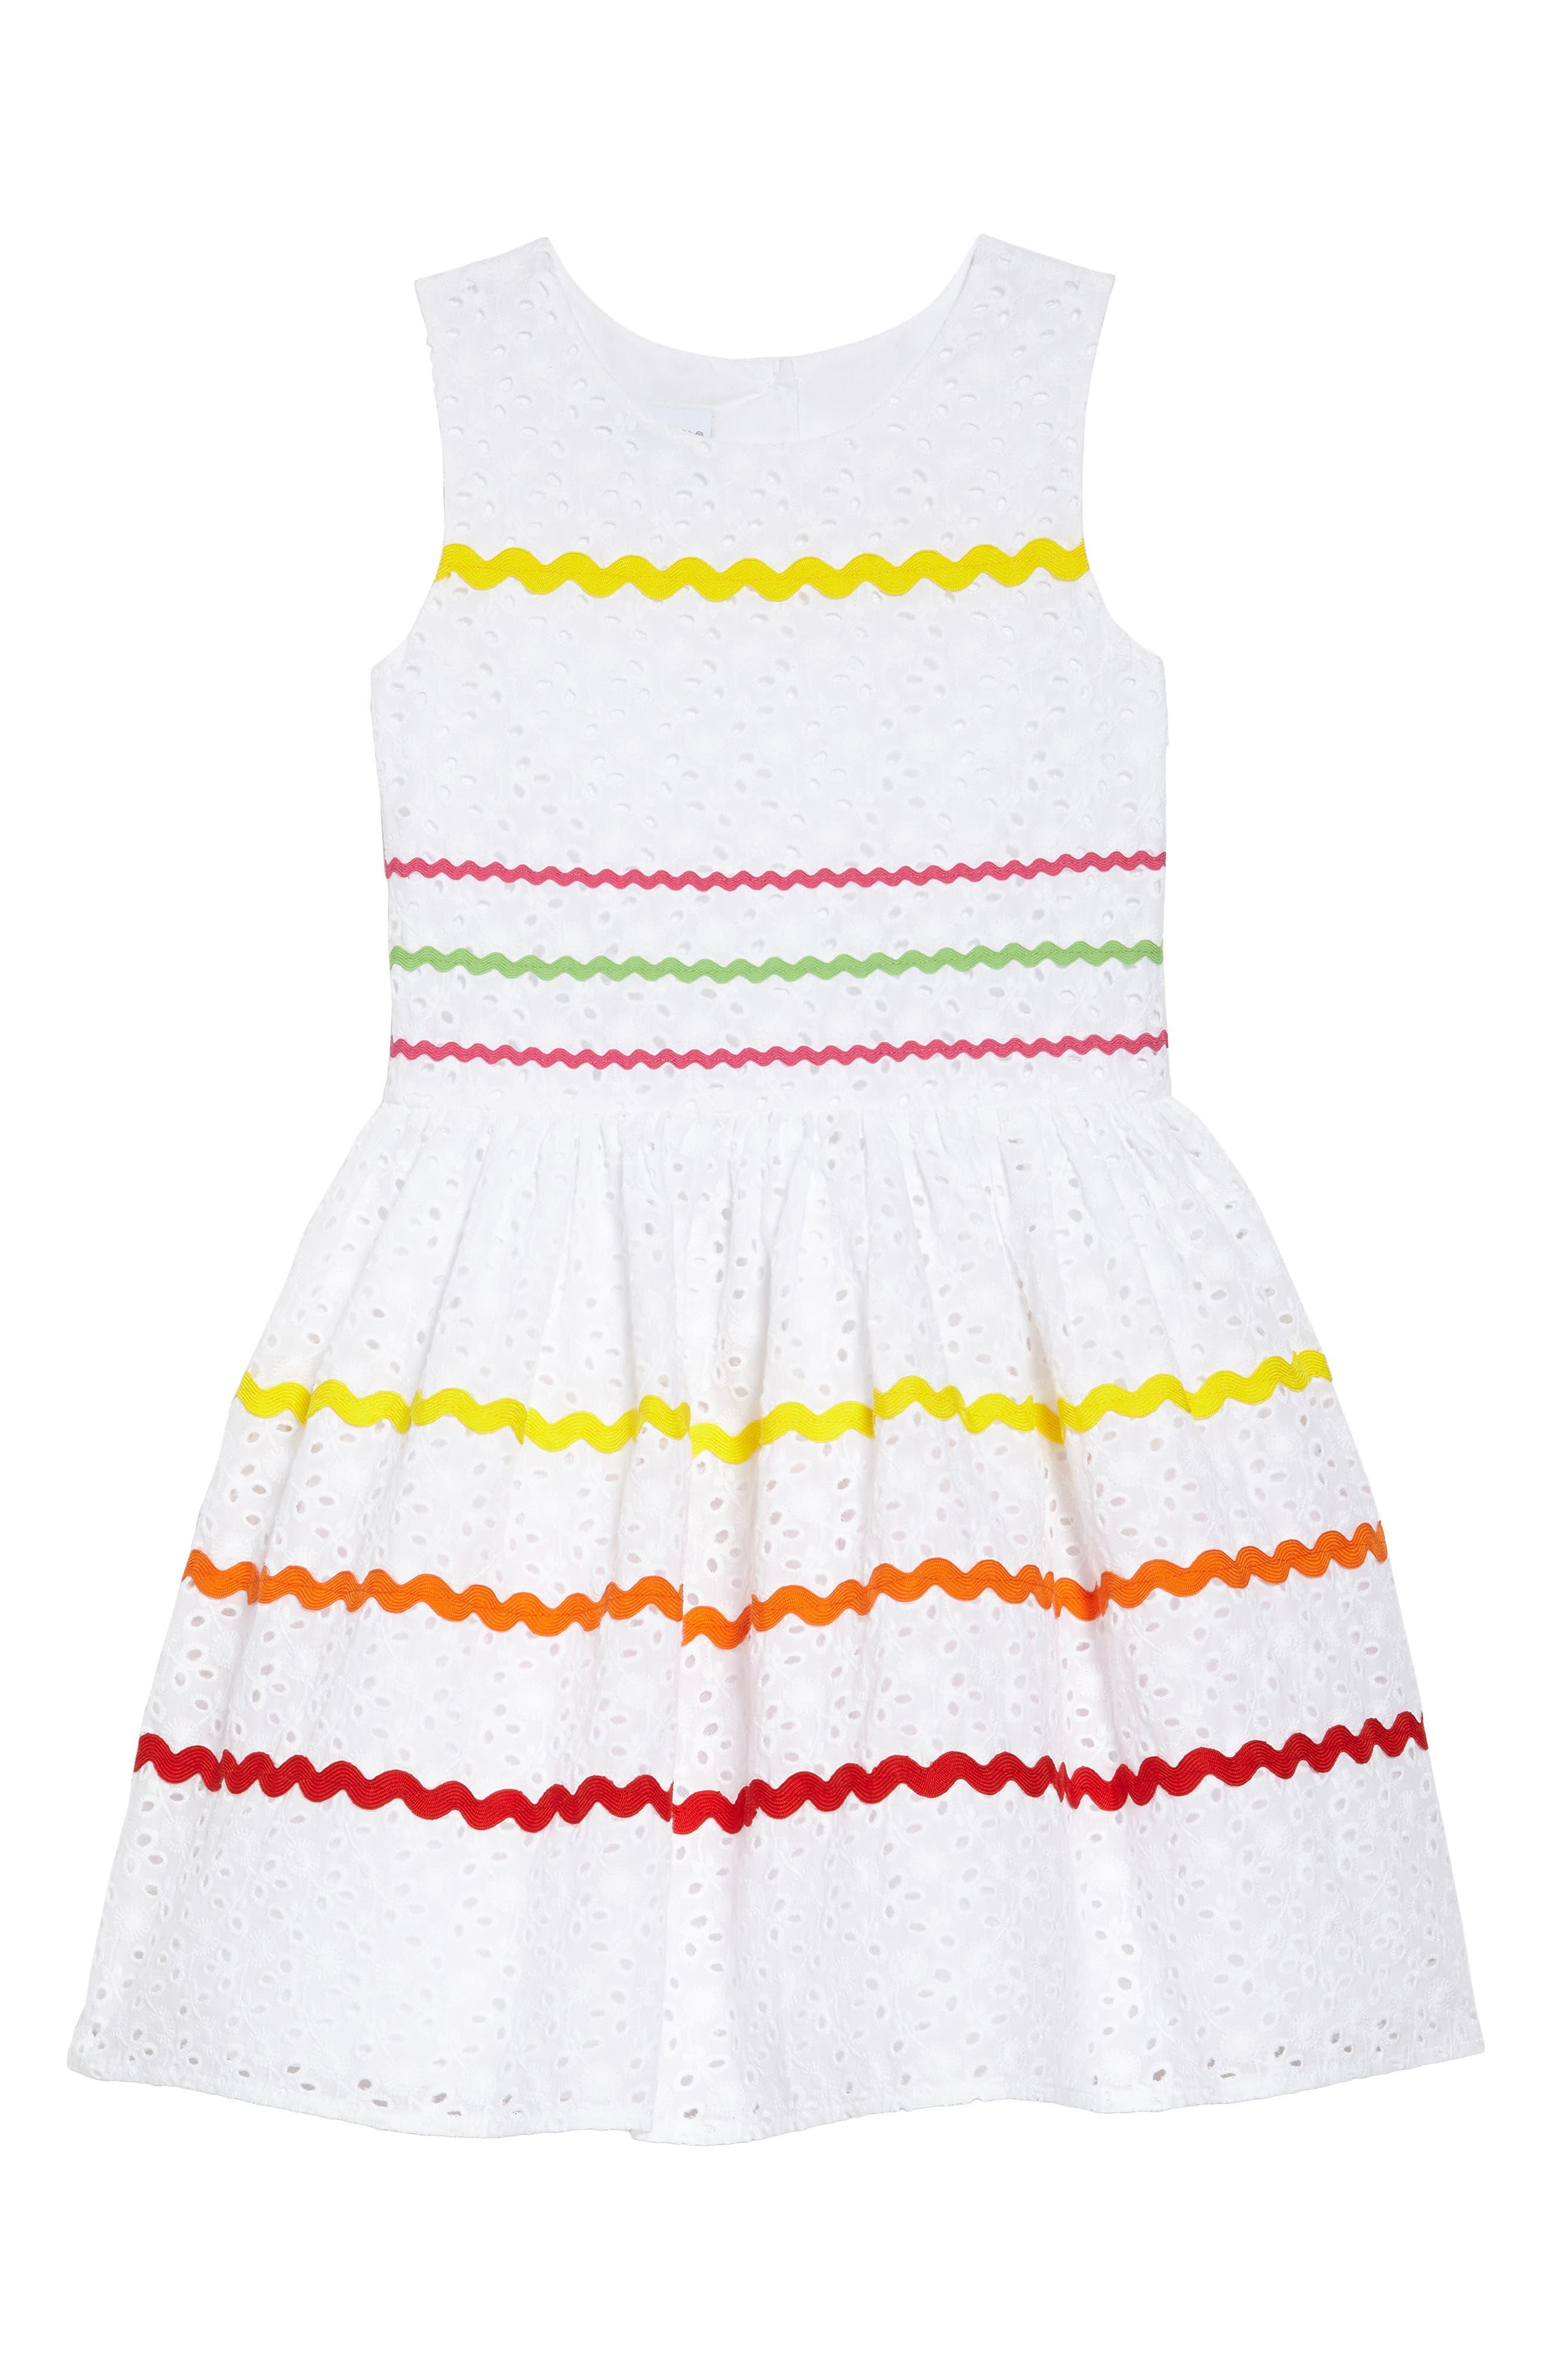 Rickrack Stripe Eyelet Dress,                         Main,                         color, White